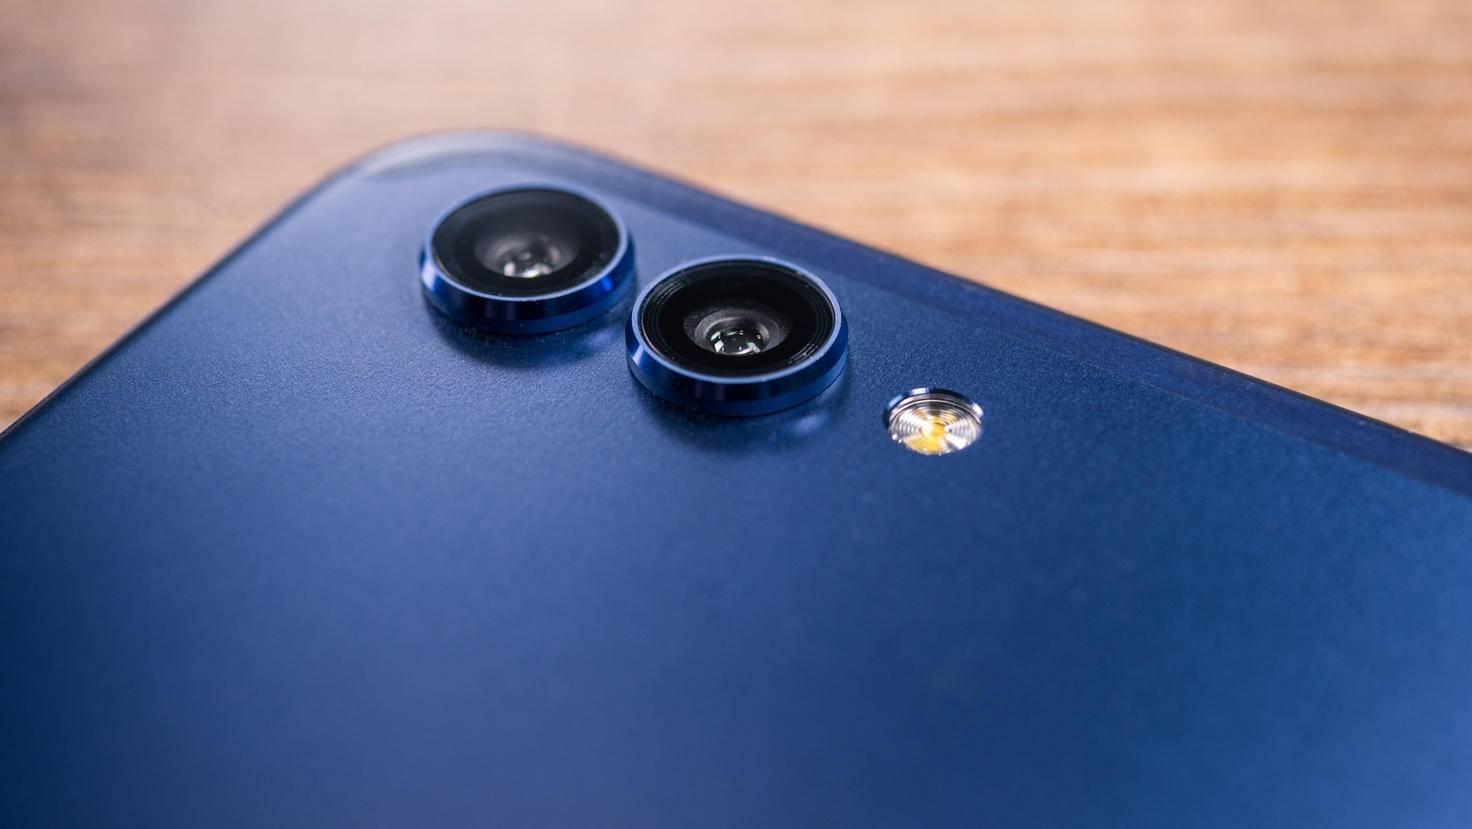 Die Dual-Kamera ragt auffällig aus dem Gehäuse.